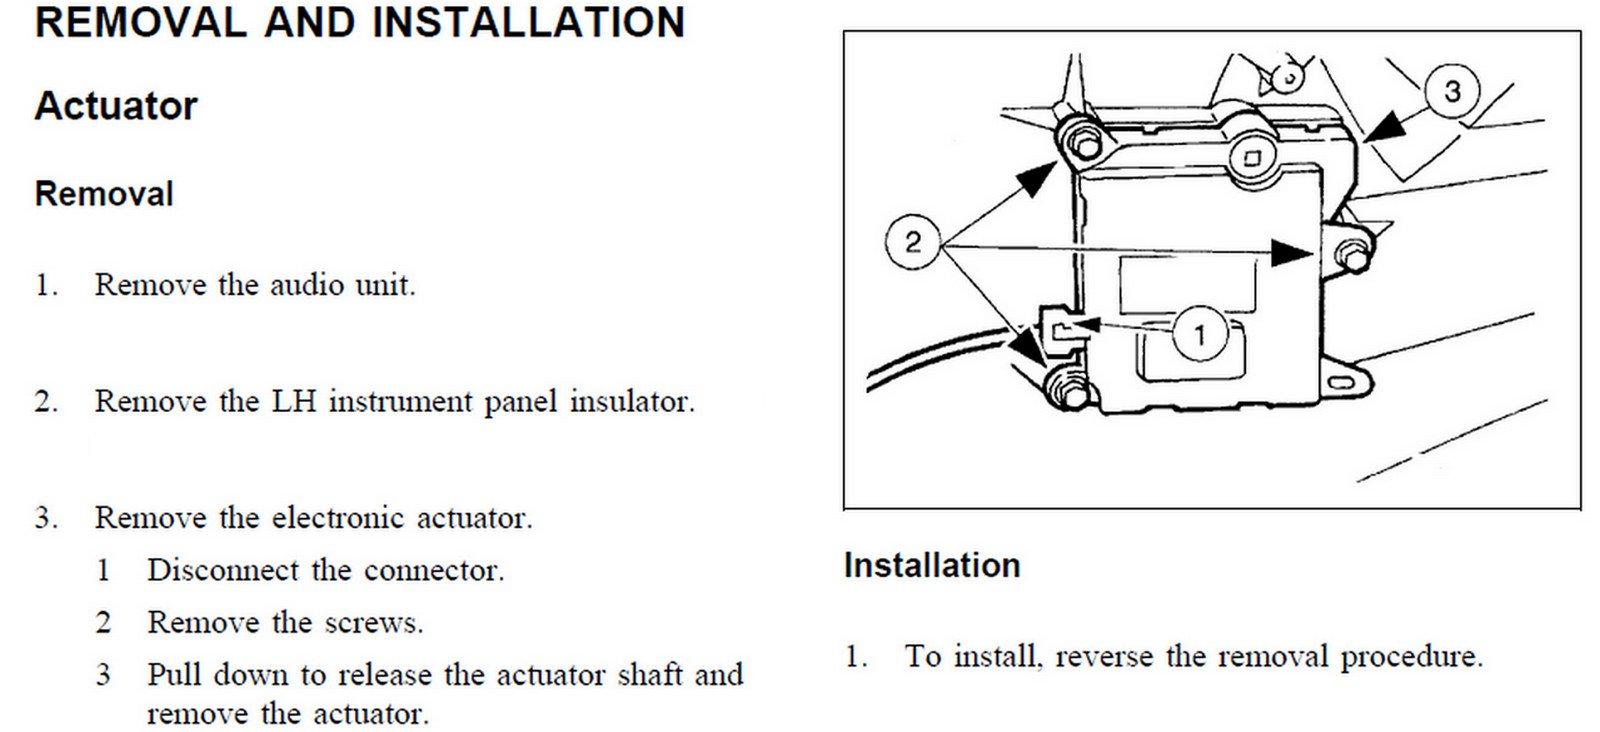 2015 Nissan Armada Wiring Diagram Electrical 2008 Heater Actuator 2000 F150 Blows Cold Air Html Autos Post Brake Controller